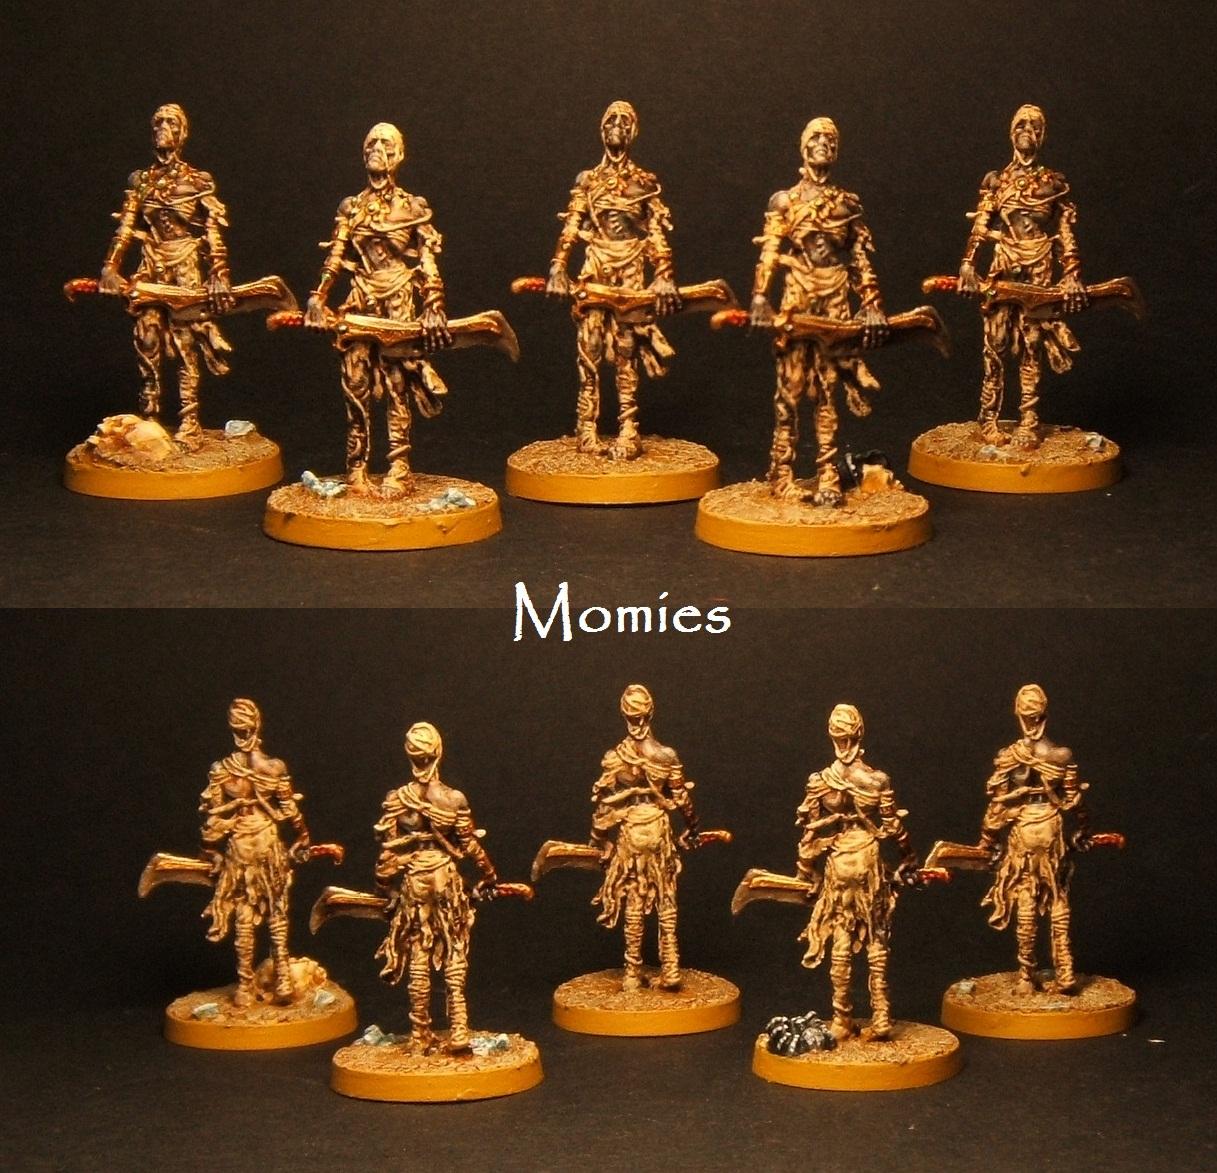 momies.jpg.f236b682195b8a7b9639b381e7b3e036.jpg